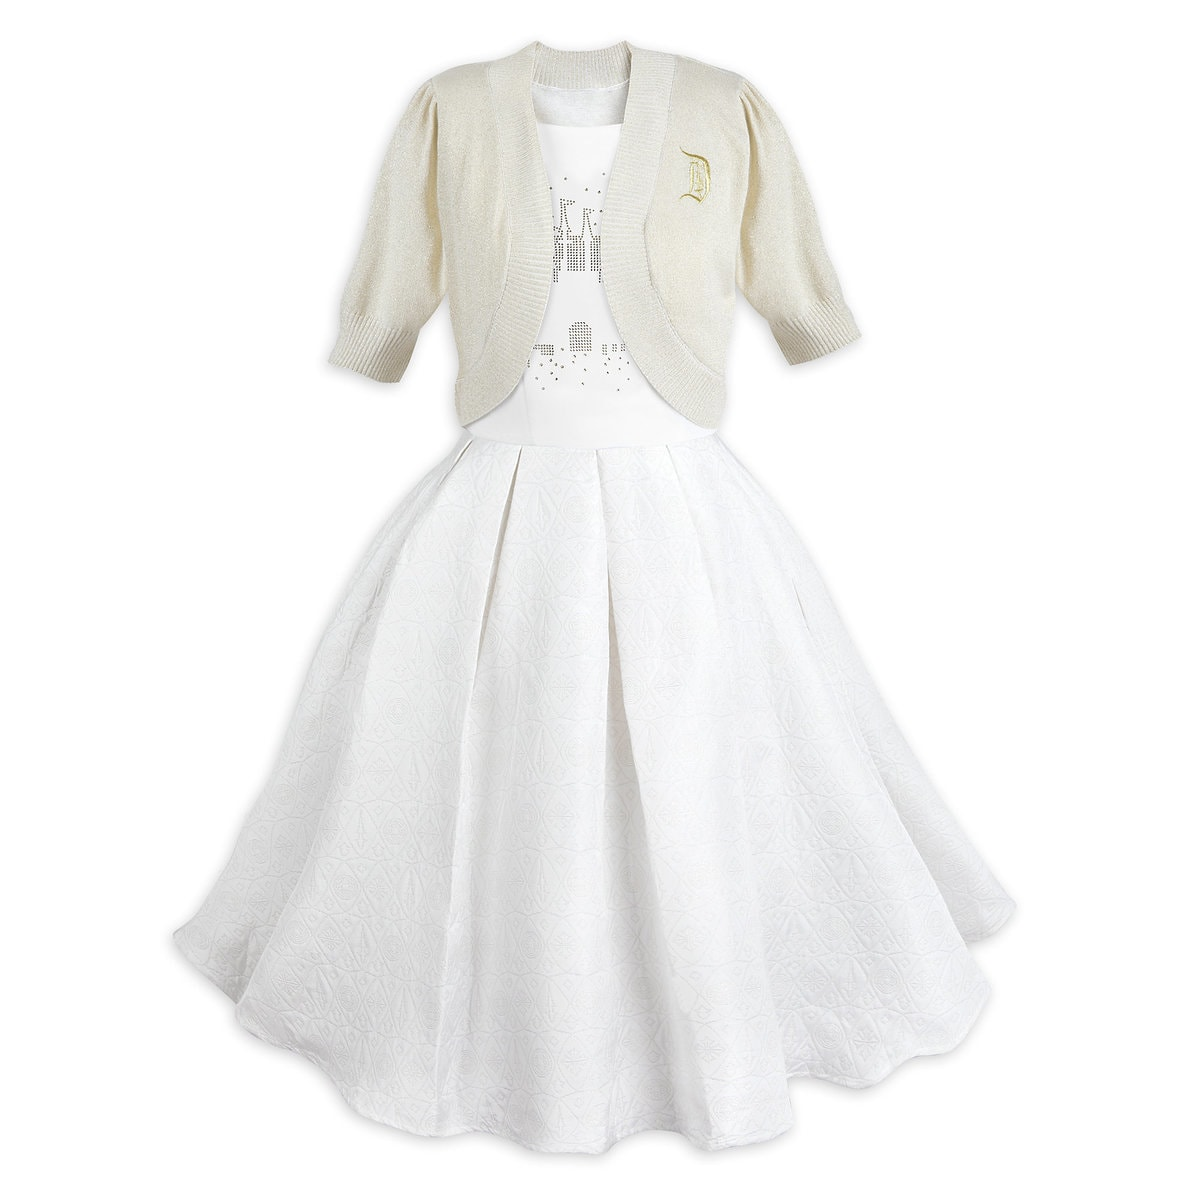 69e75205543 Product Image of Fantasyland Castle Dress and Cardigan Set for Women   1